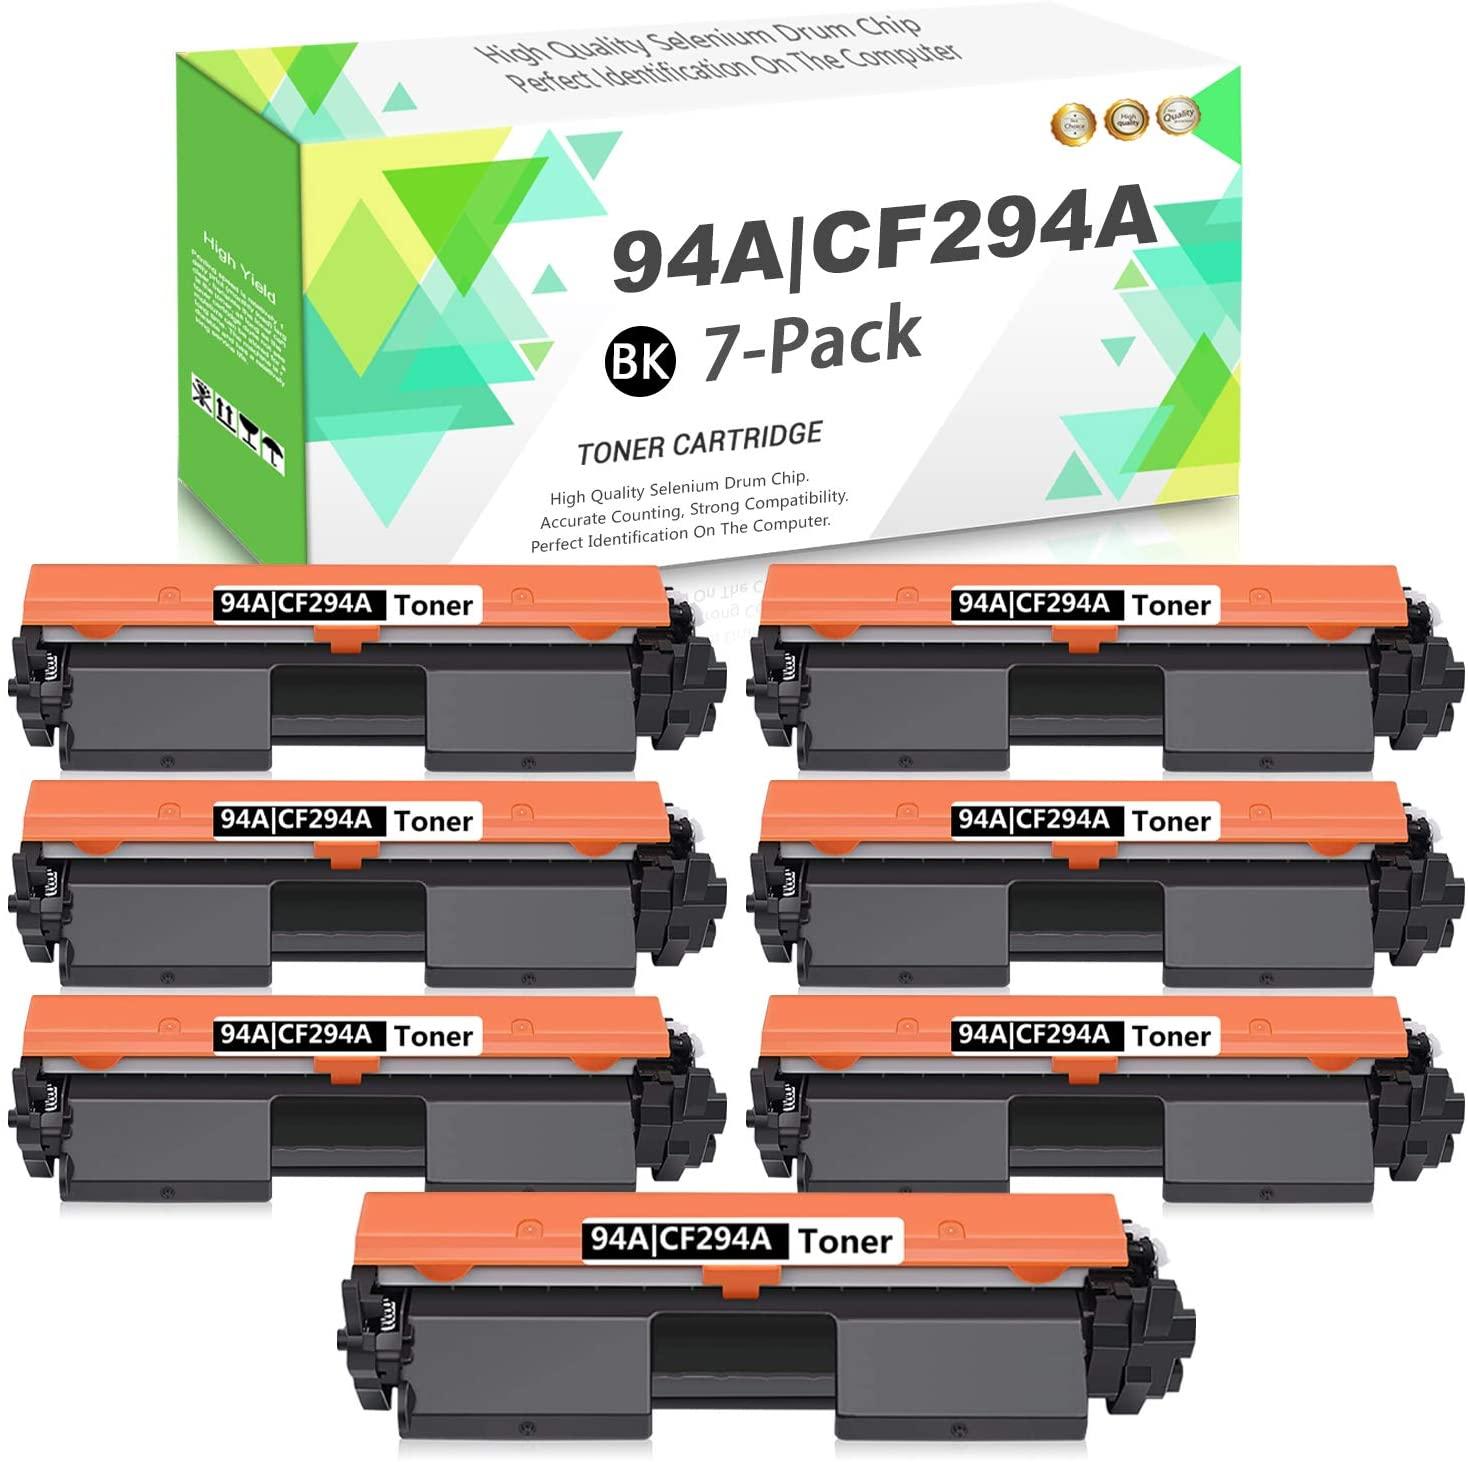 Compatible 94A | CF294A Toner Cartridge (Black,7-Pack) Replacement for HP Laserjet Pro MFP M148fdw MFP M148dw M118dw MFP M148-M149 M118-M119 Series Printers,Sold by TmallToner.